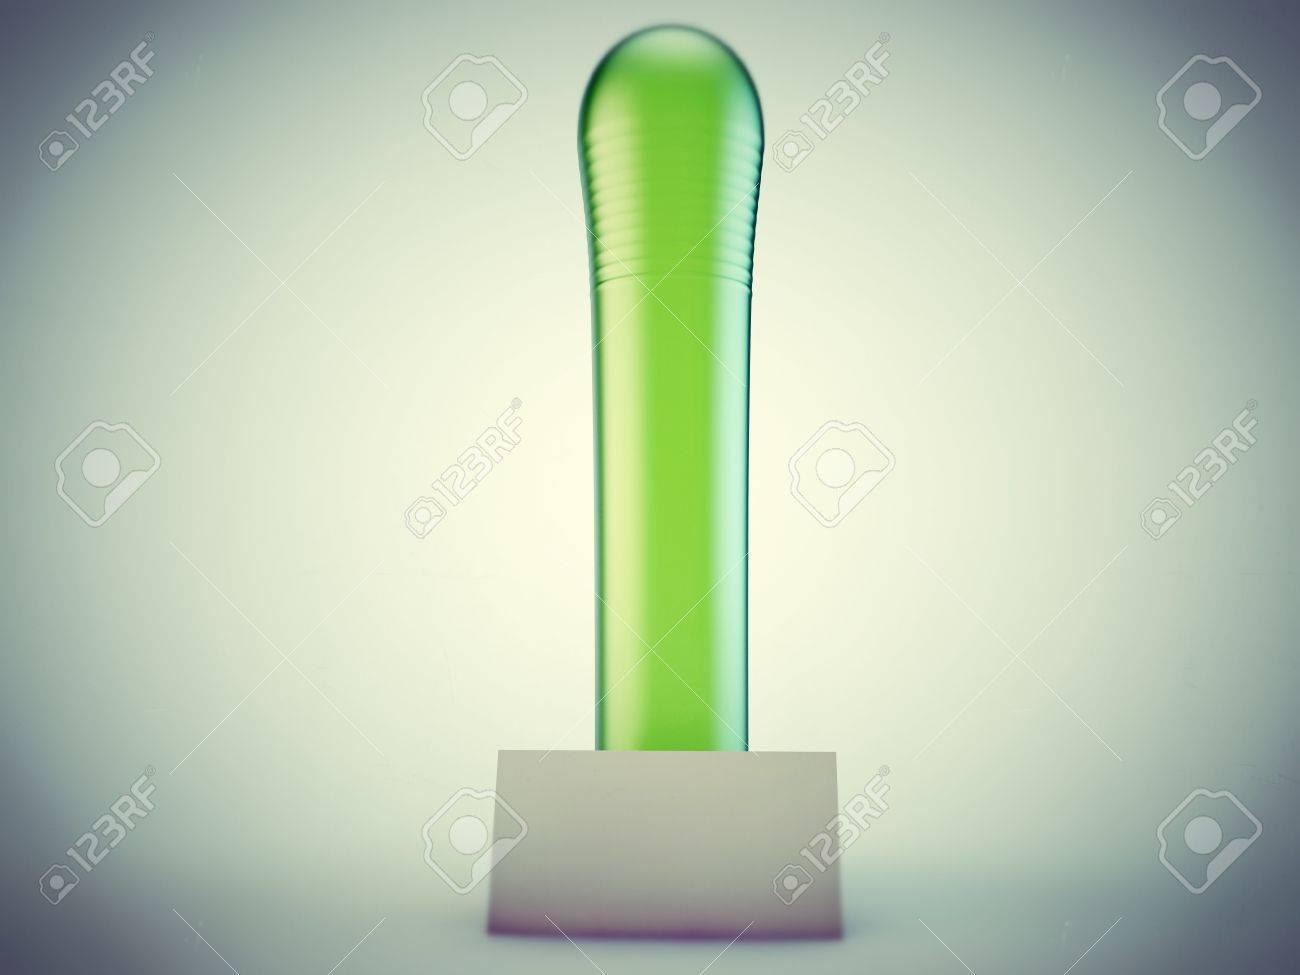 green dildo isolated on white background Stock Photo - 13372638